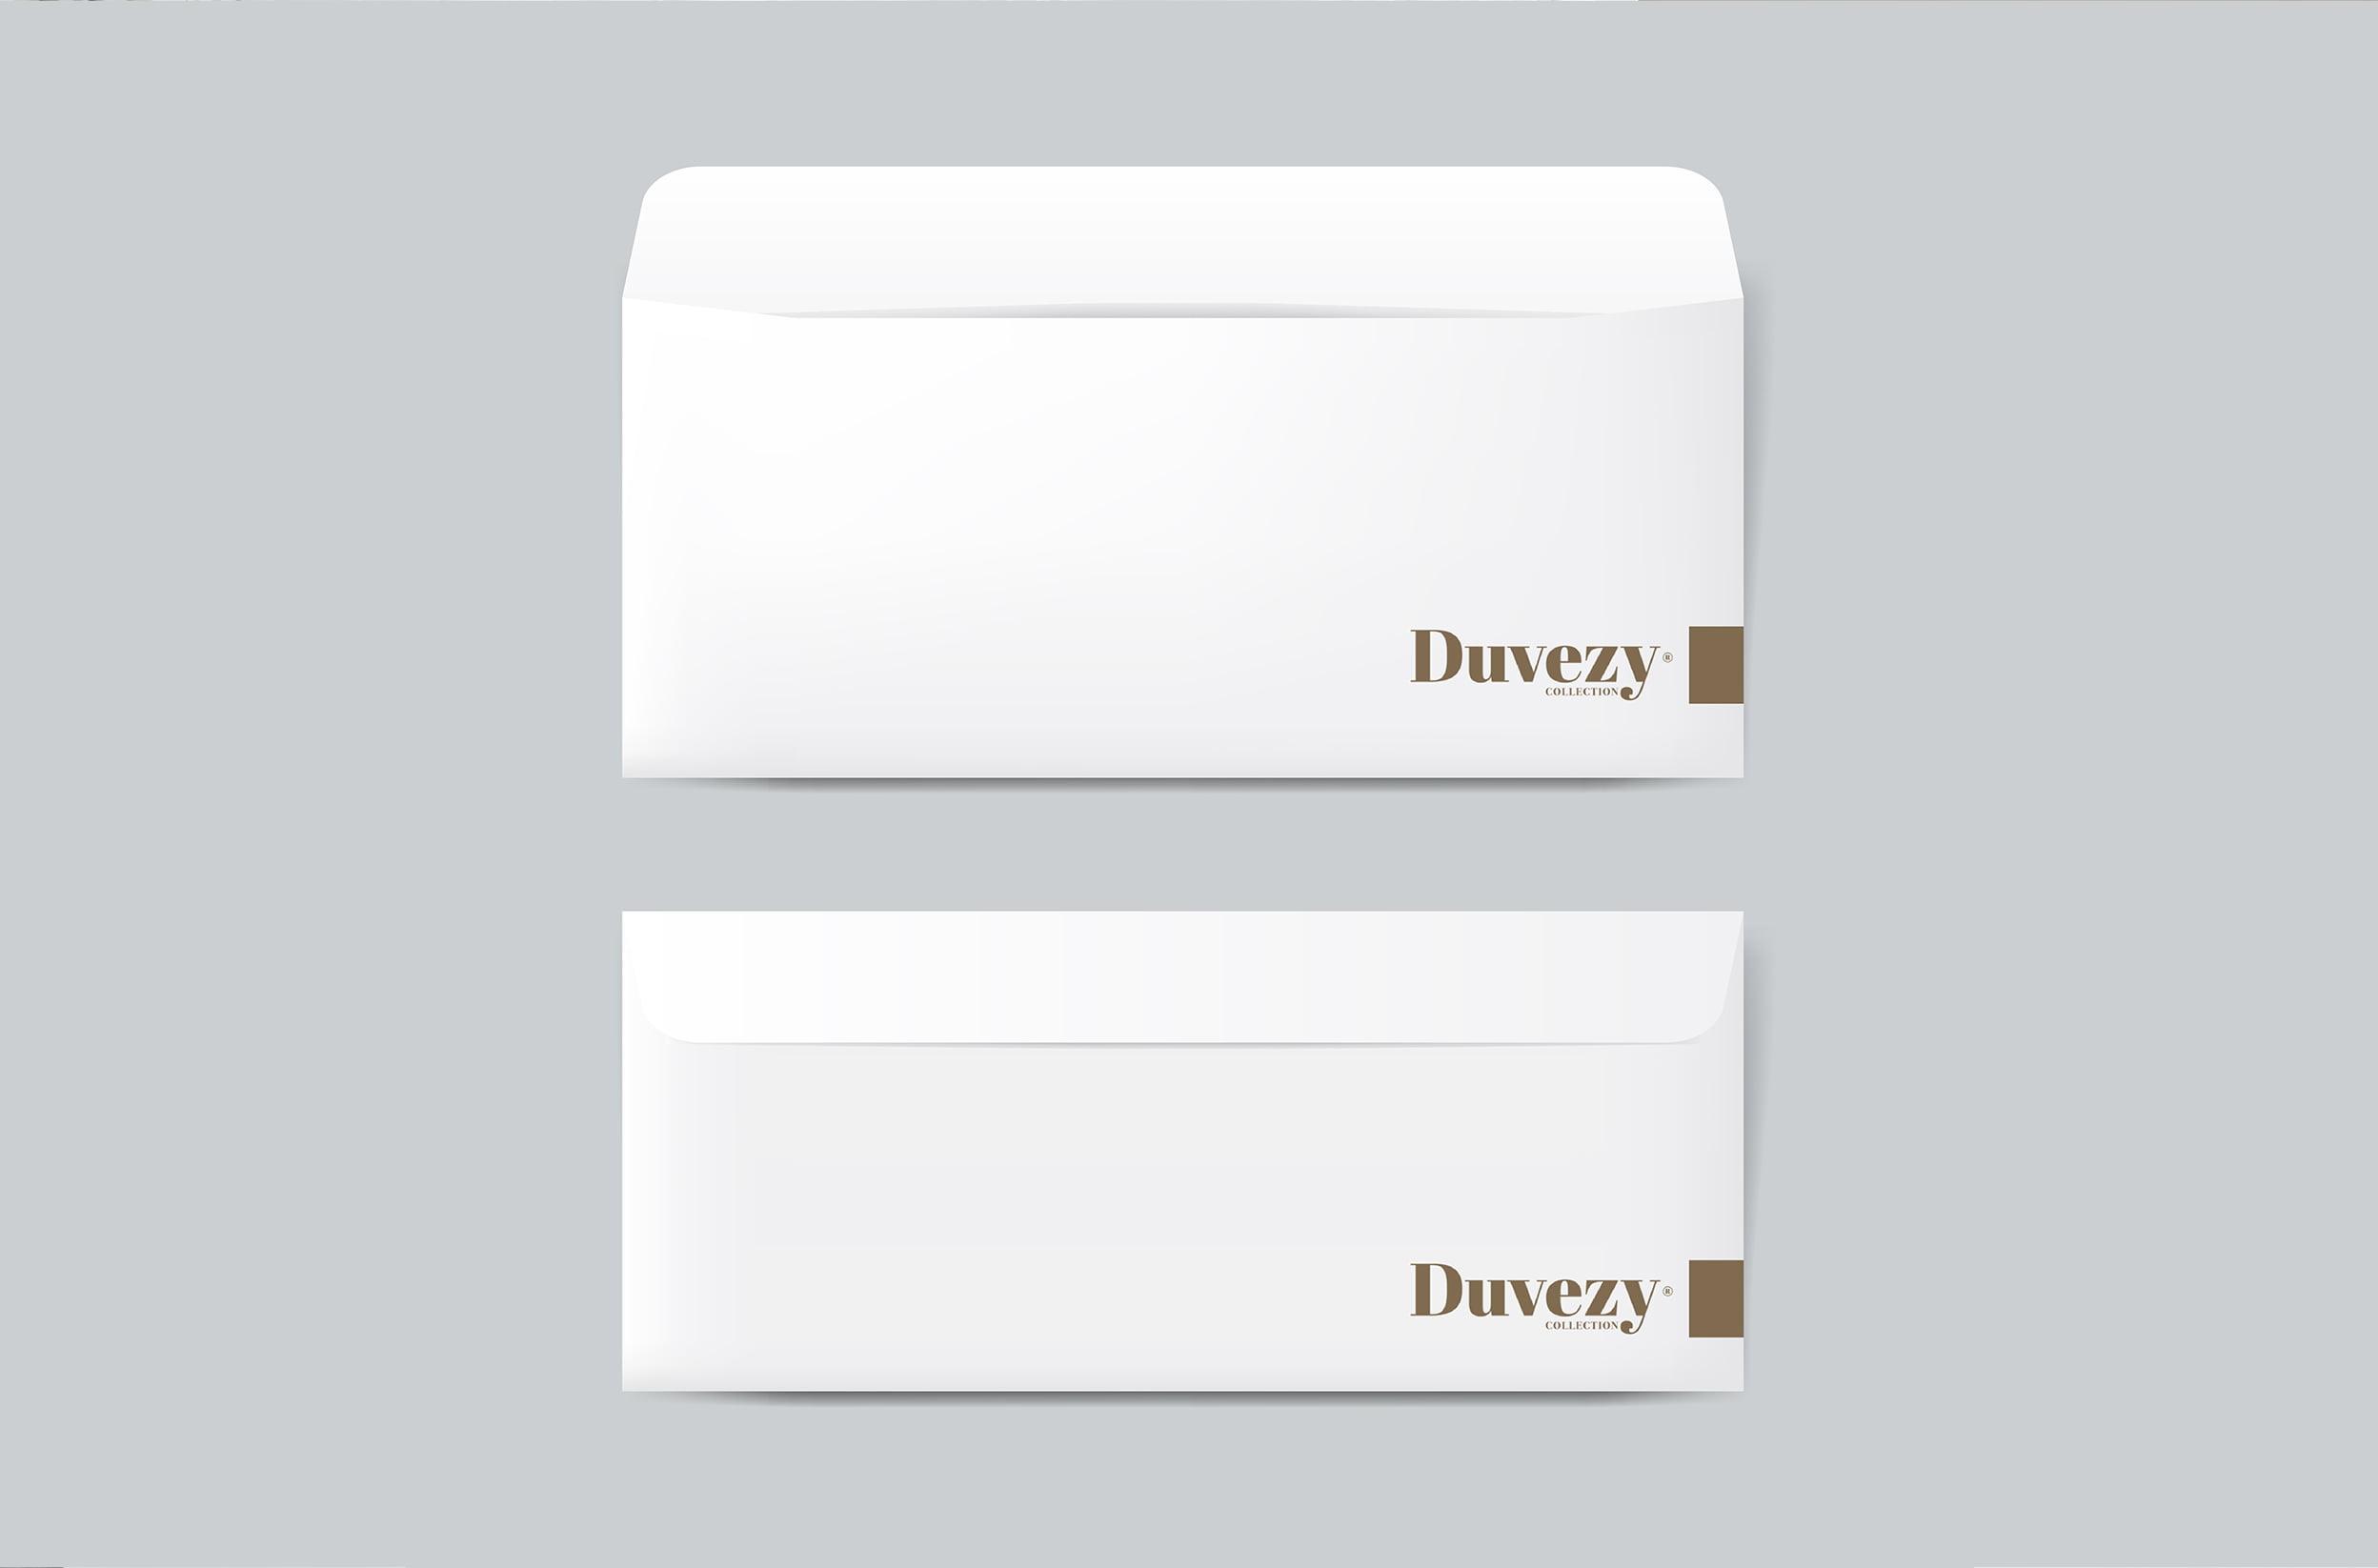 duvezy-4